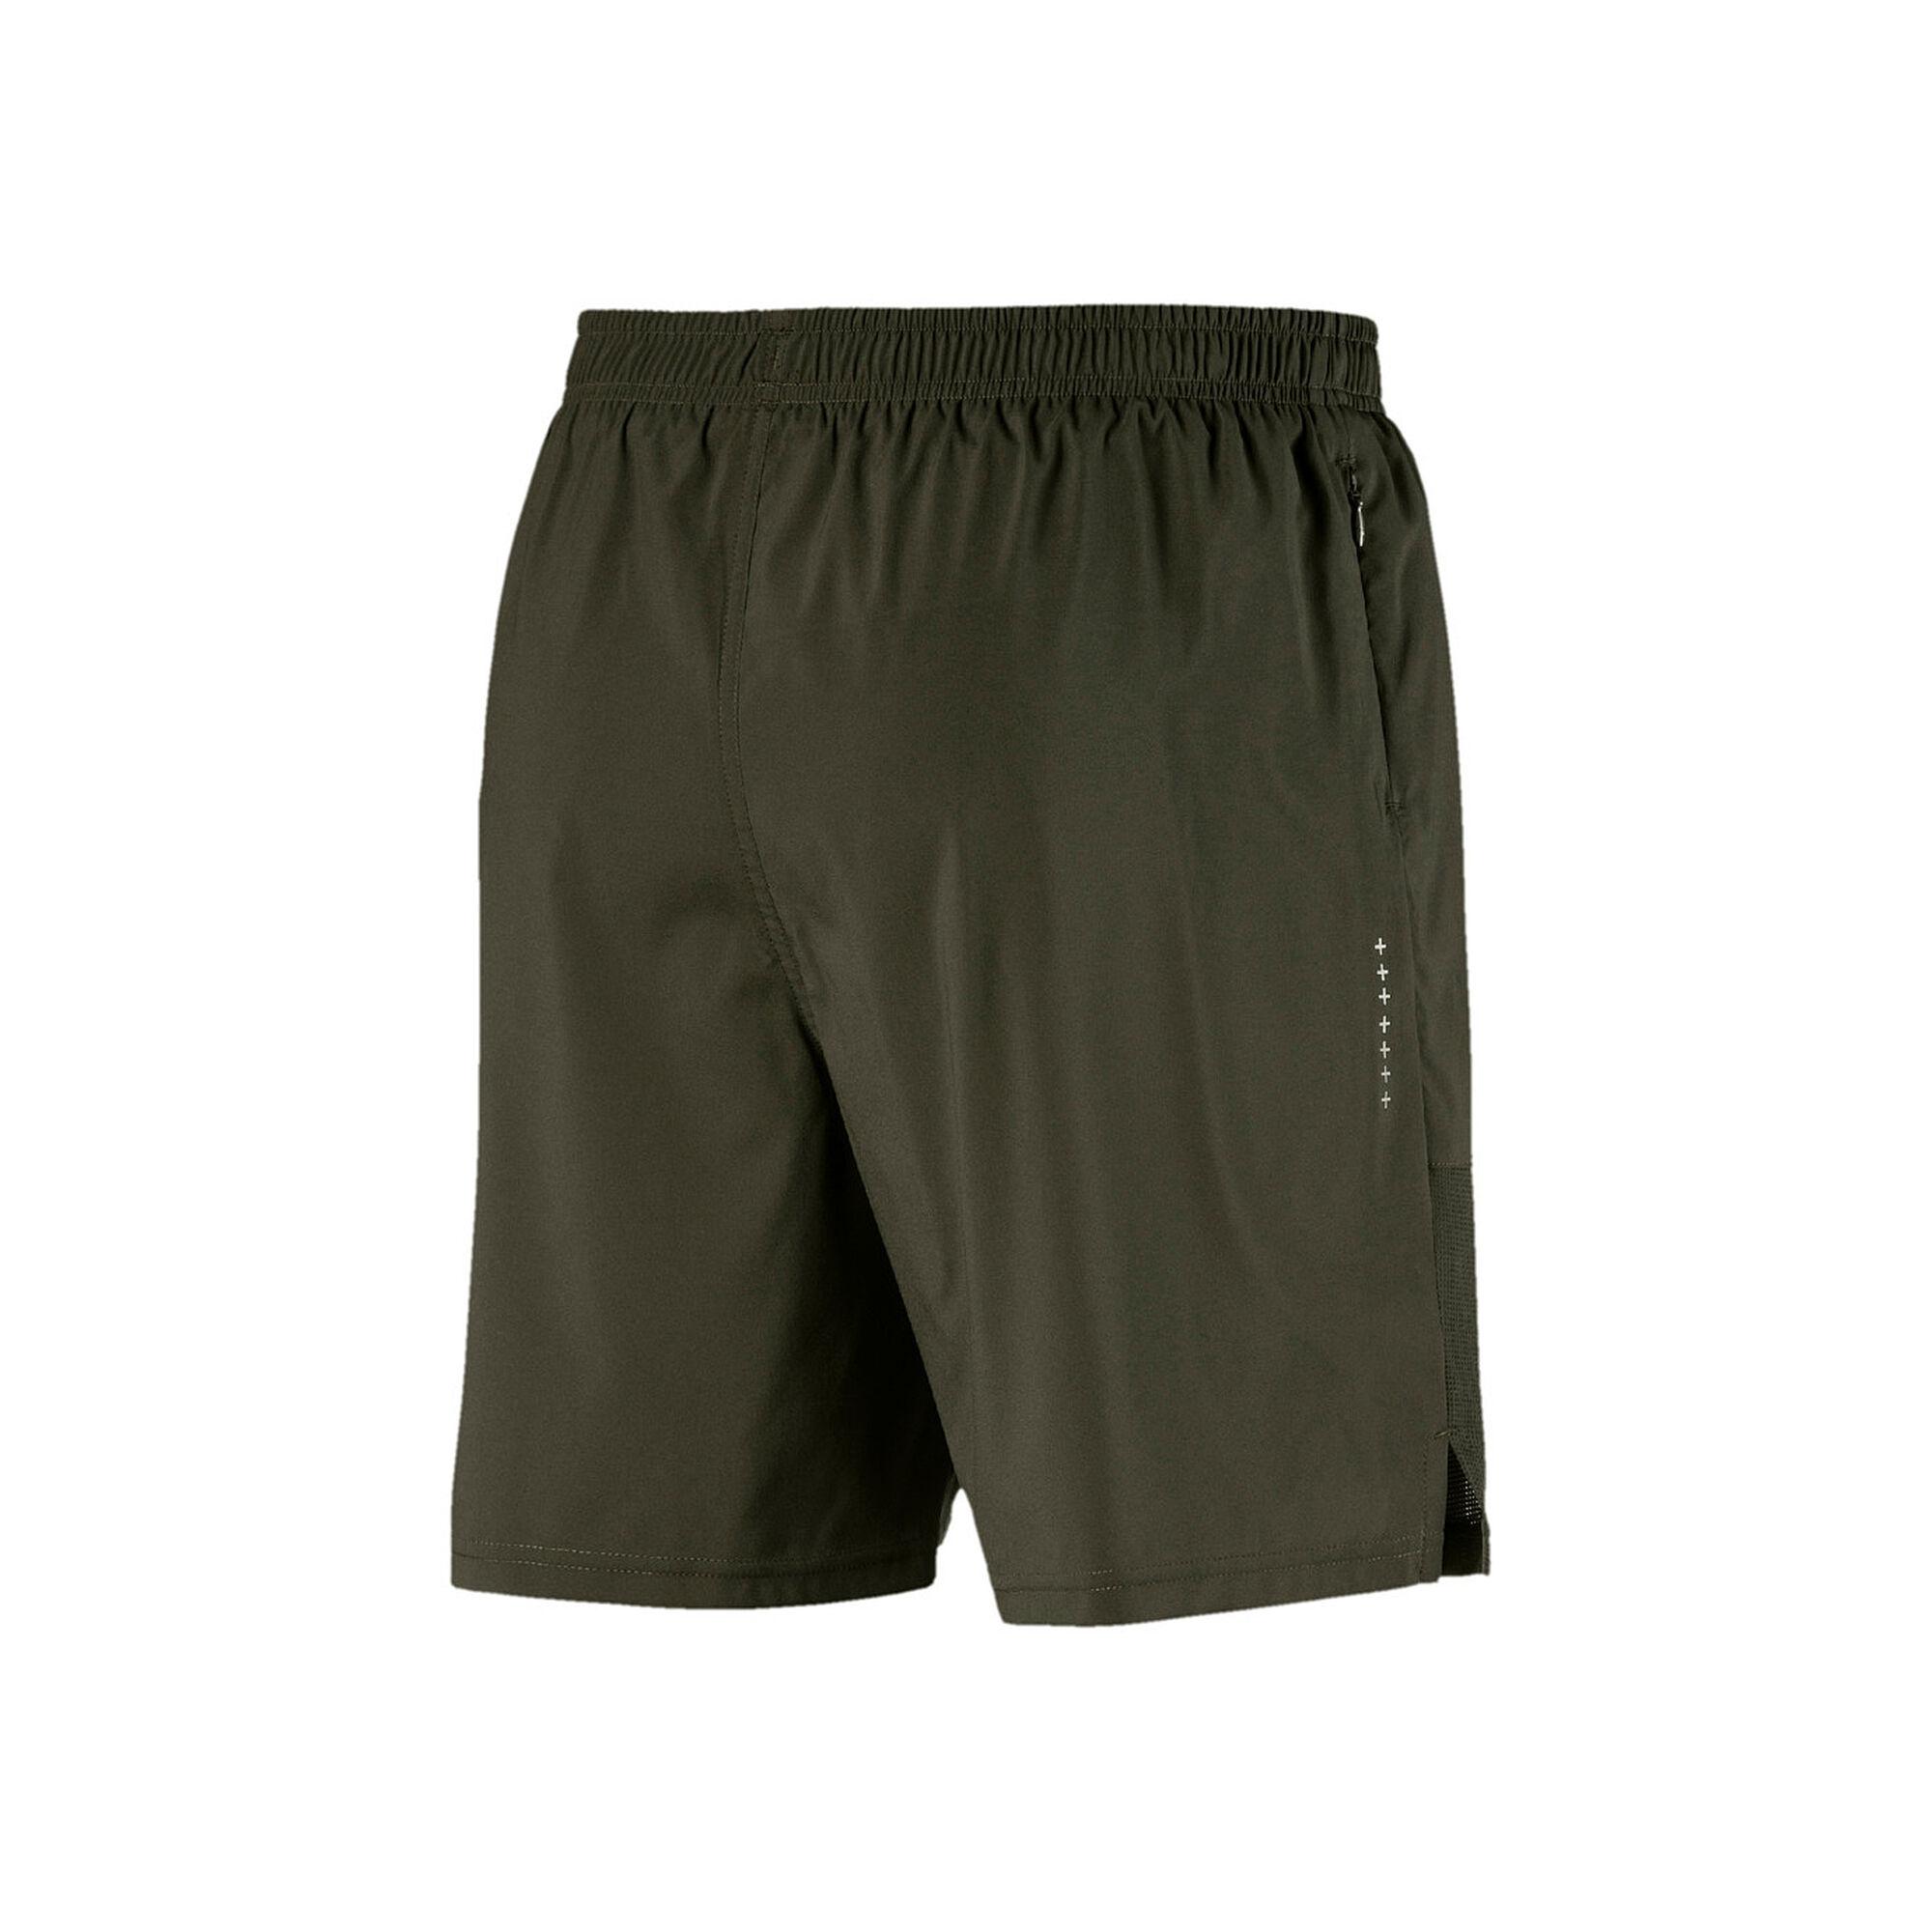 9075892a9898 buy Puma Run 7in Shorts Men - Khaki